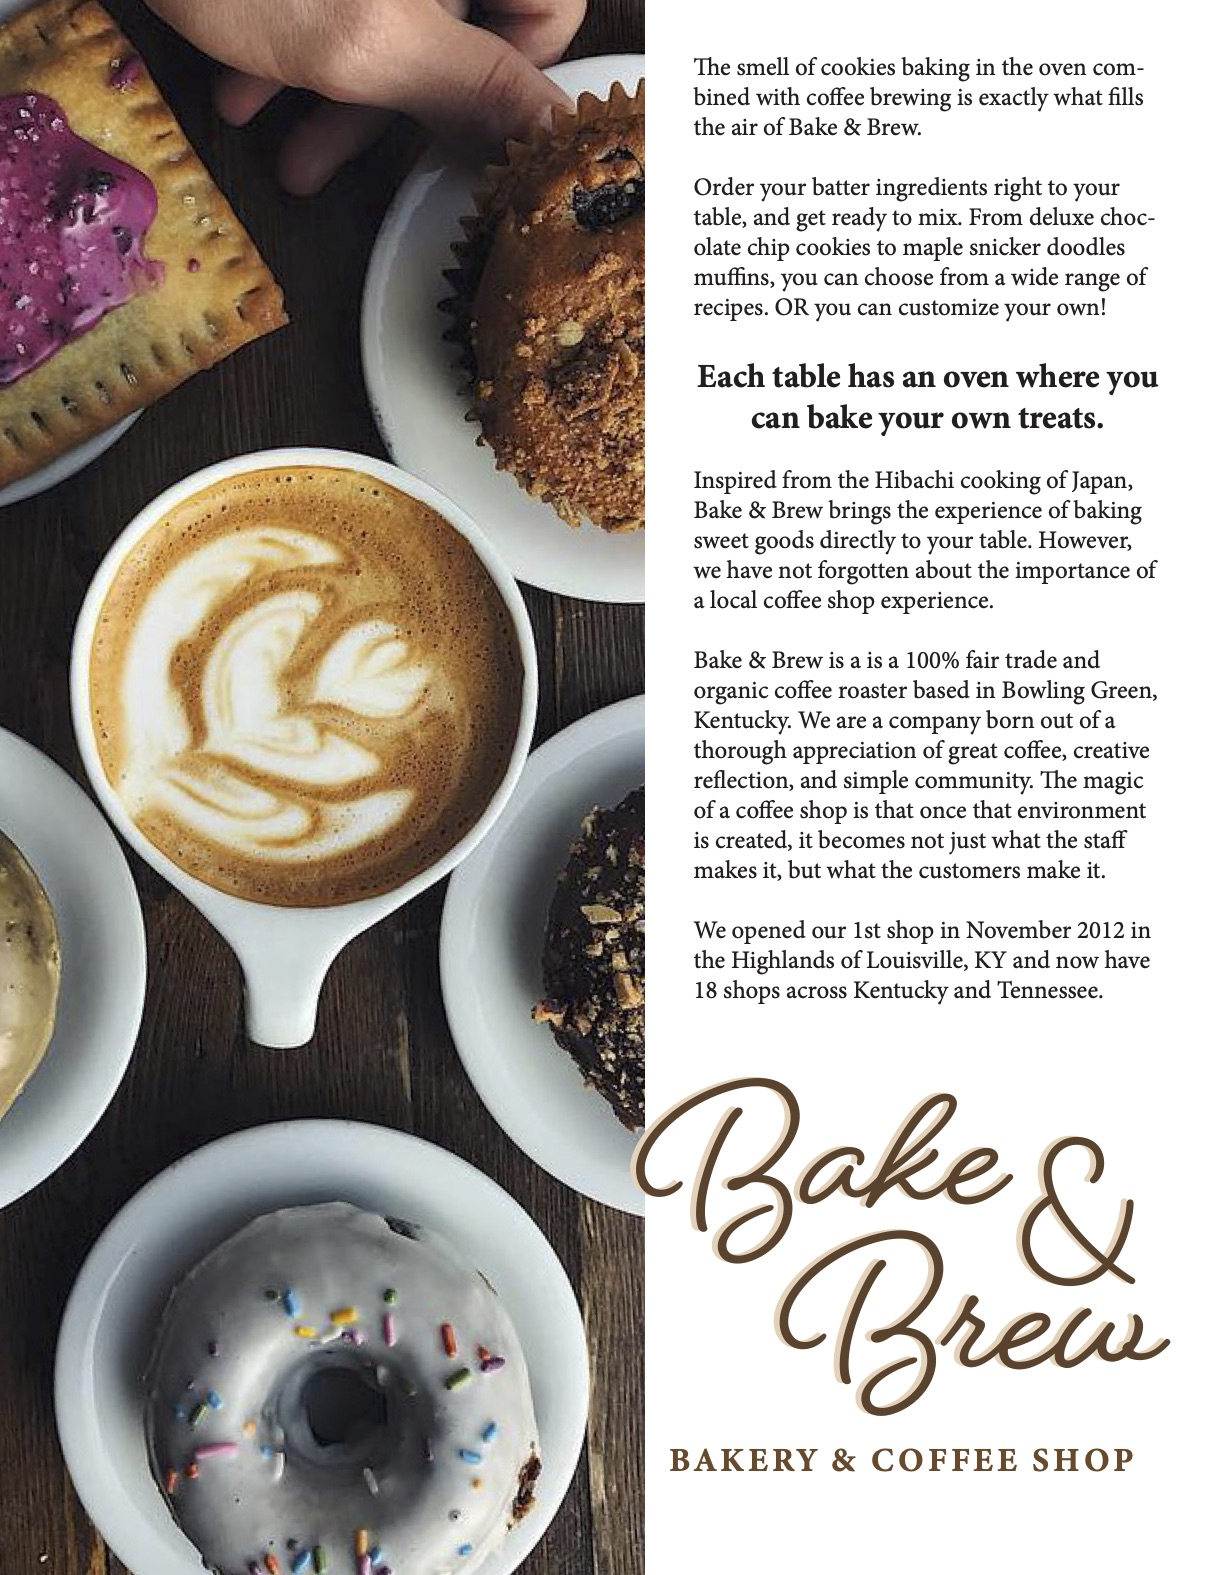 Bake & Brew